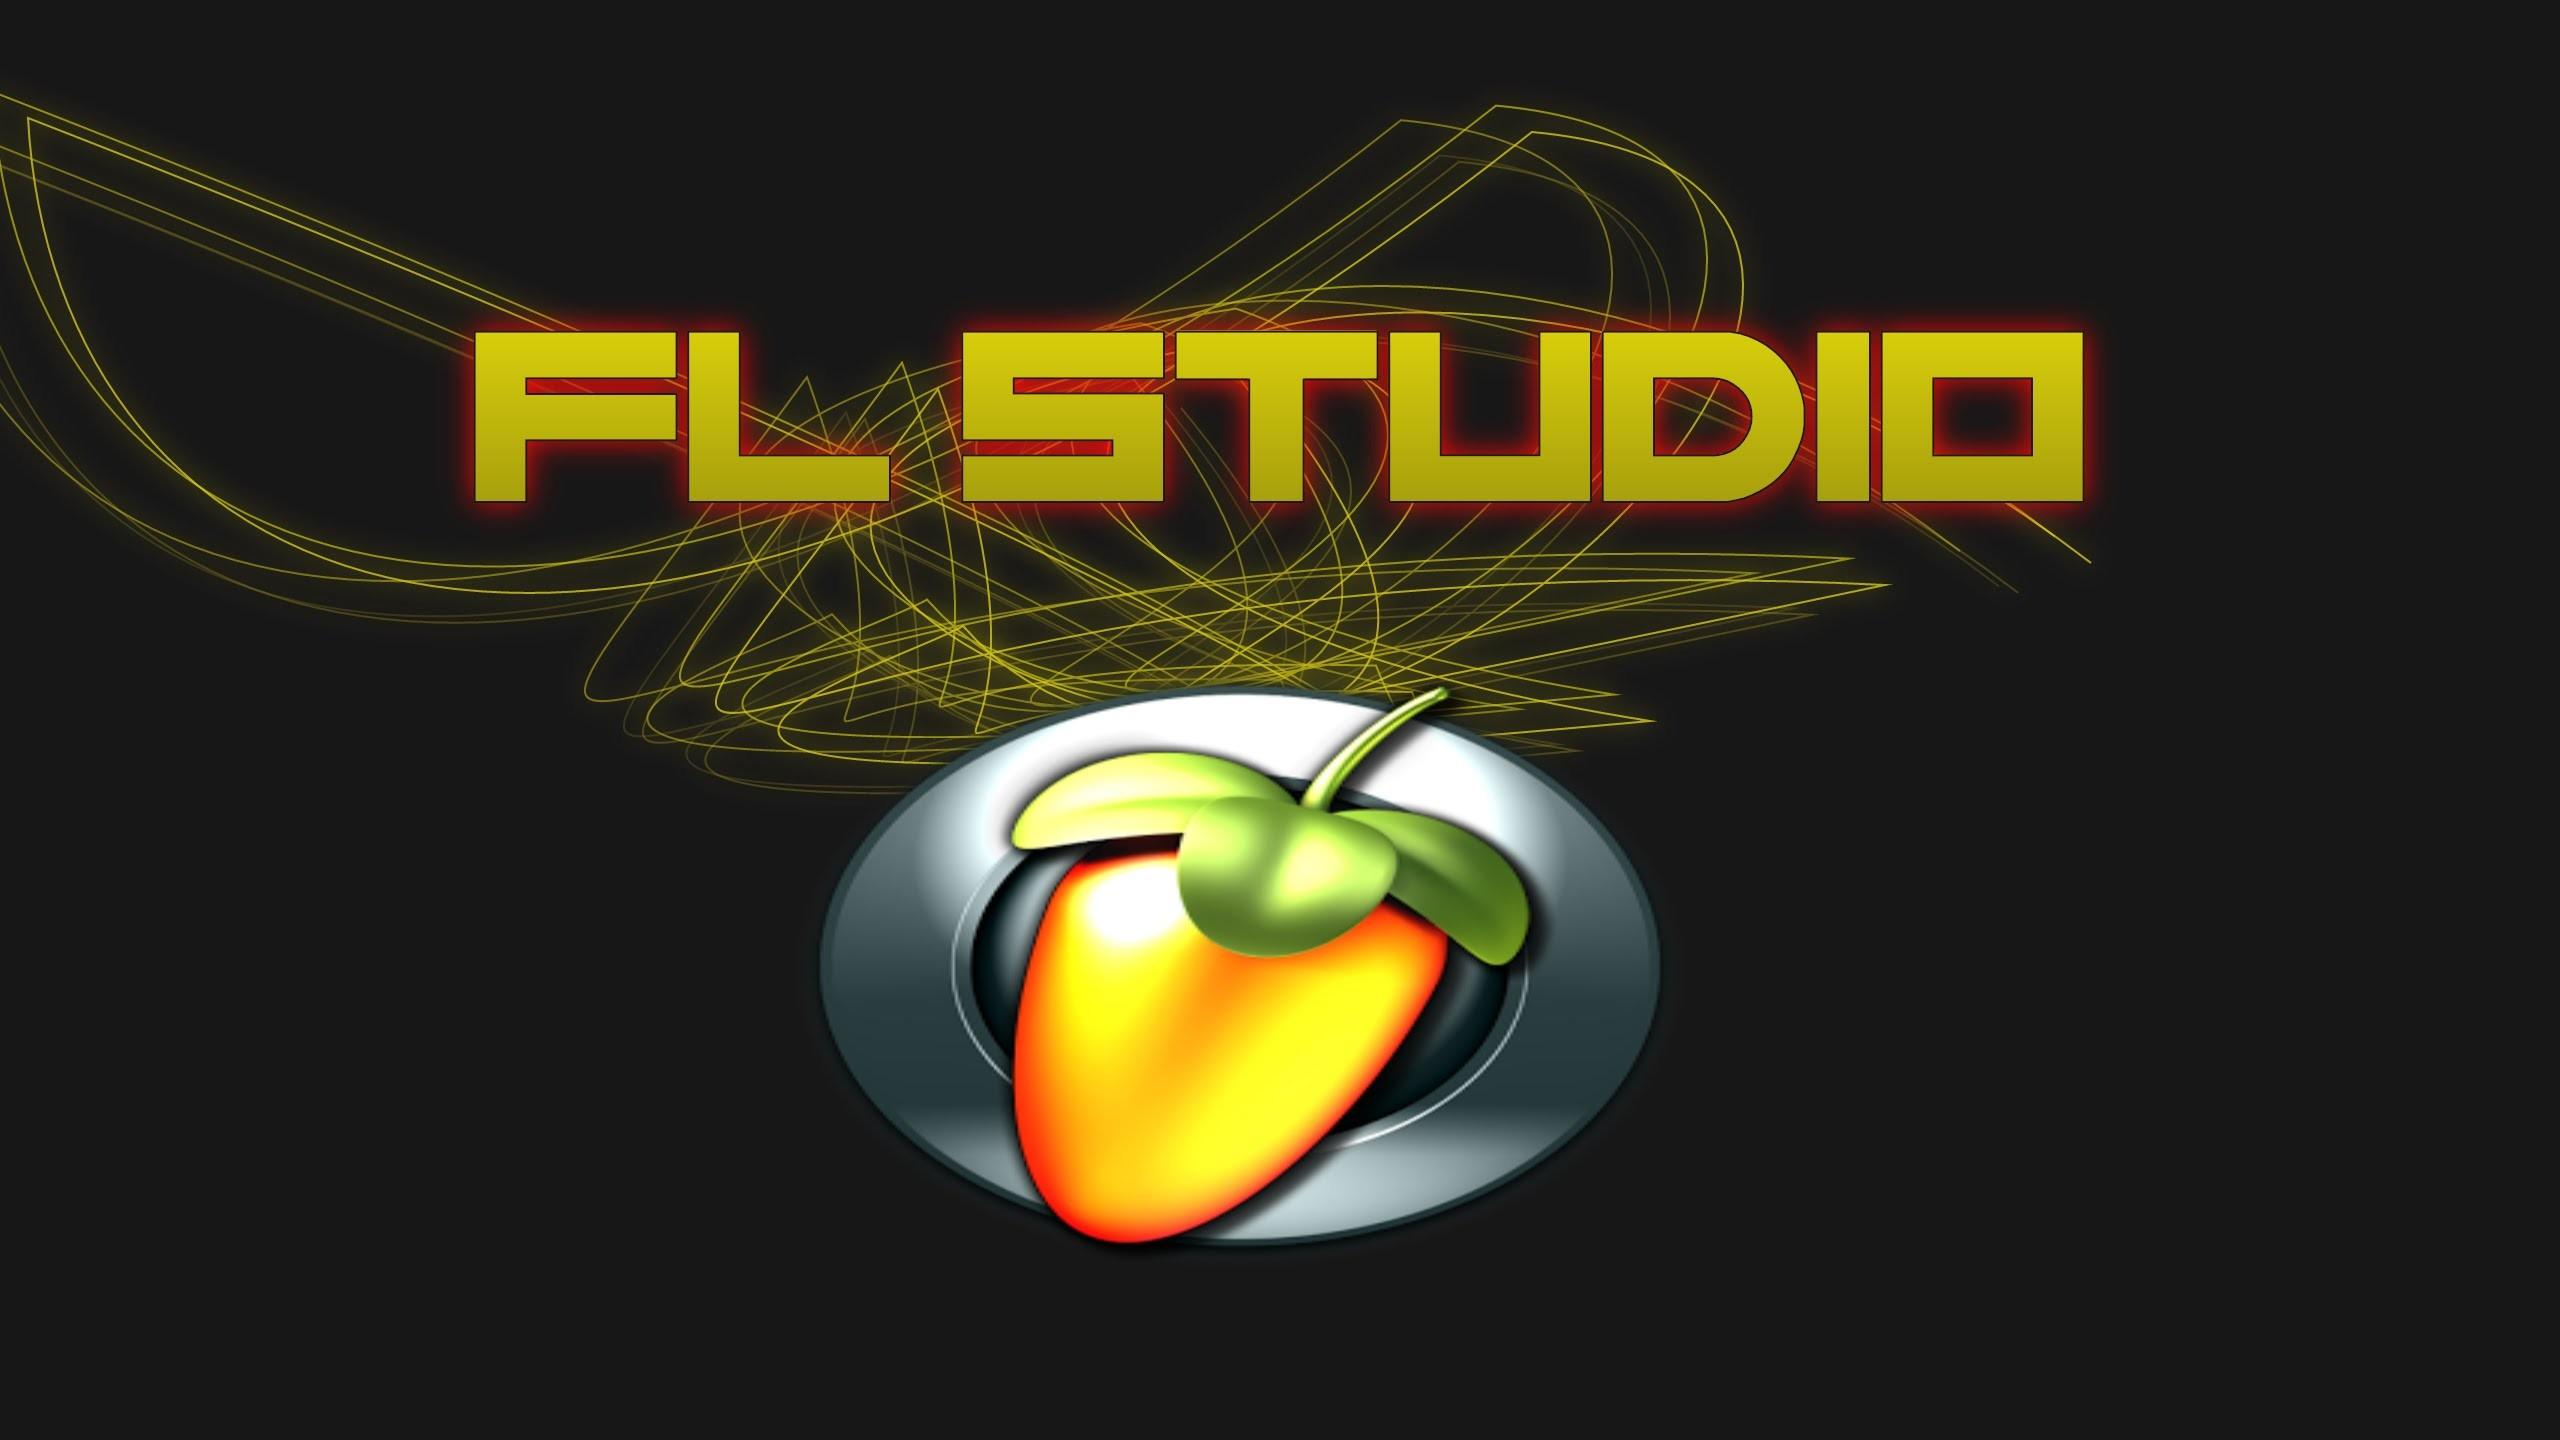 MY FIRST EDM TRACK (FL Studio 11 Producer Edition)